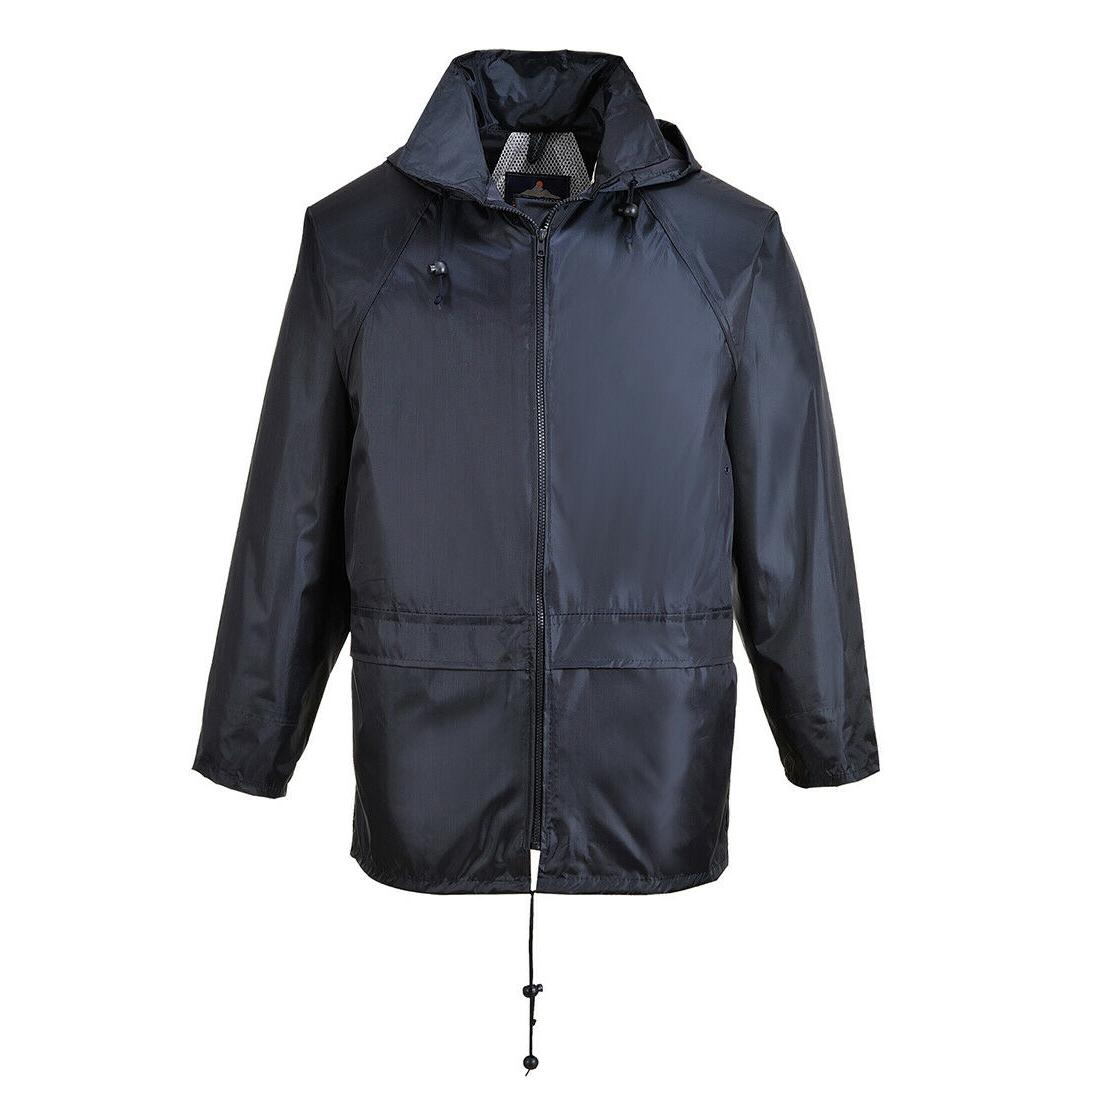 Portwest Classic Rain Jacket wth Away Hood & Seams